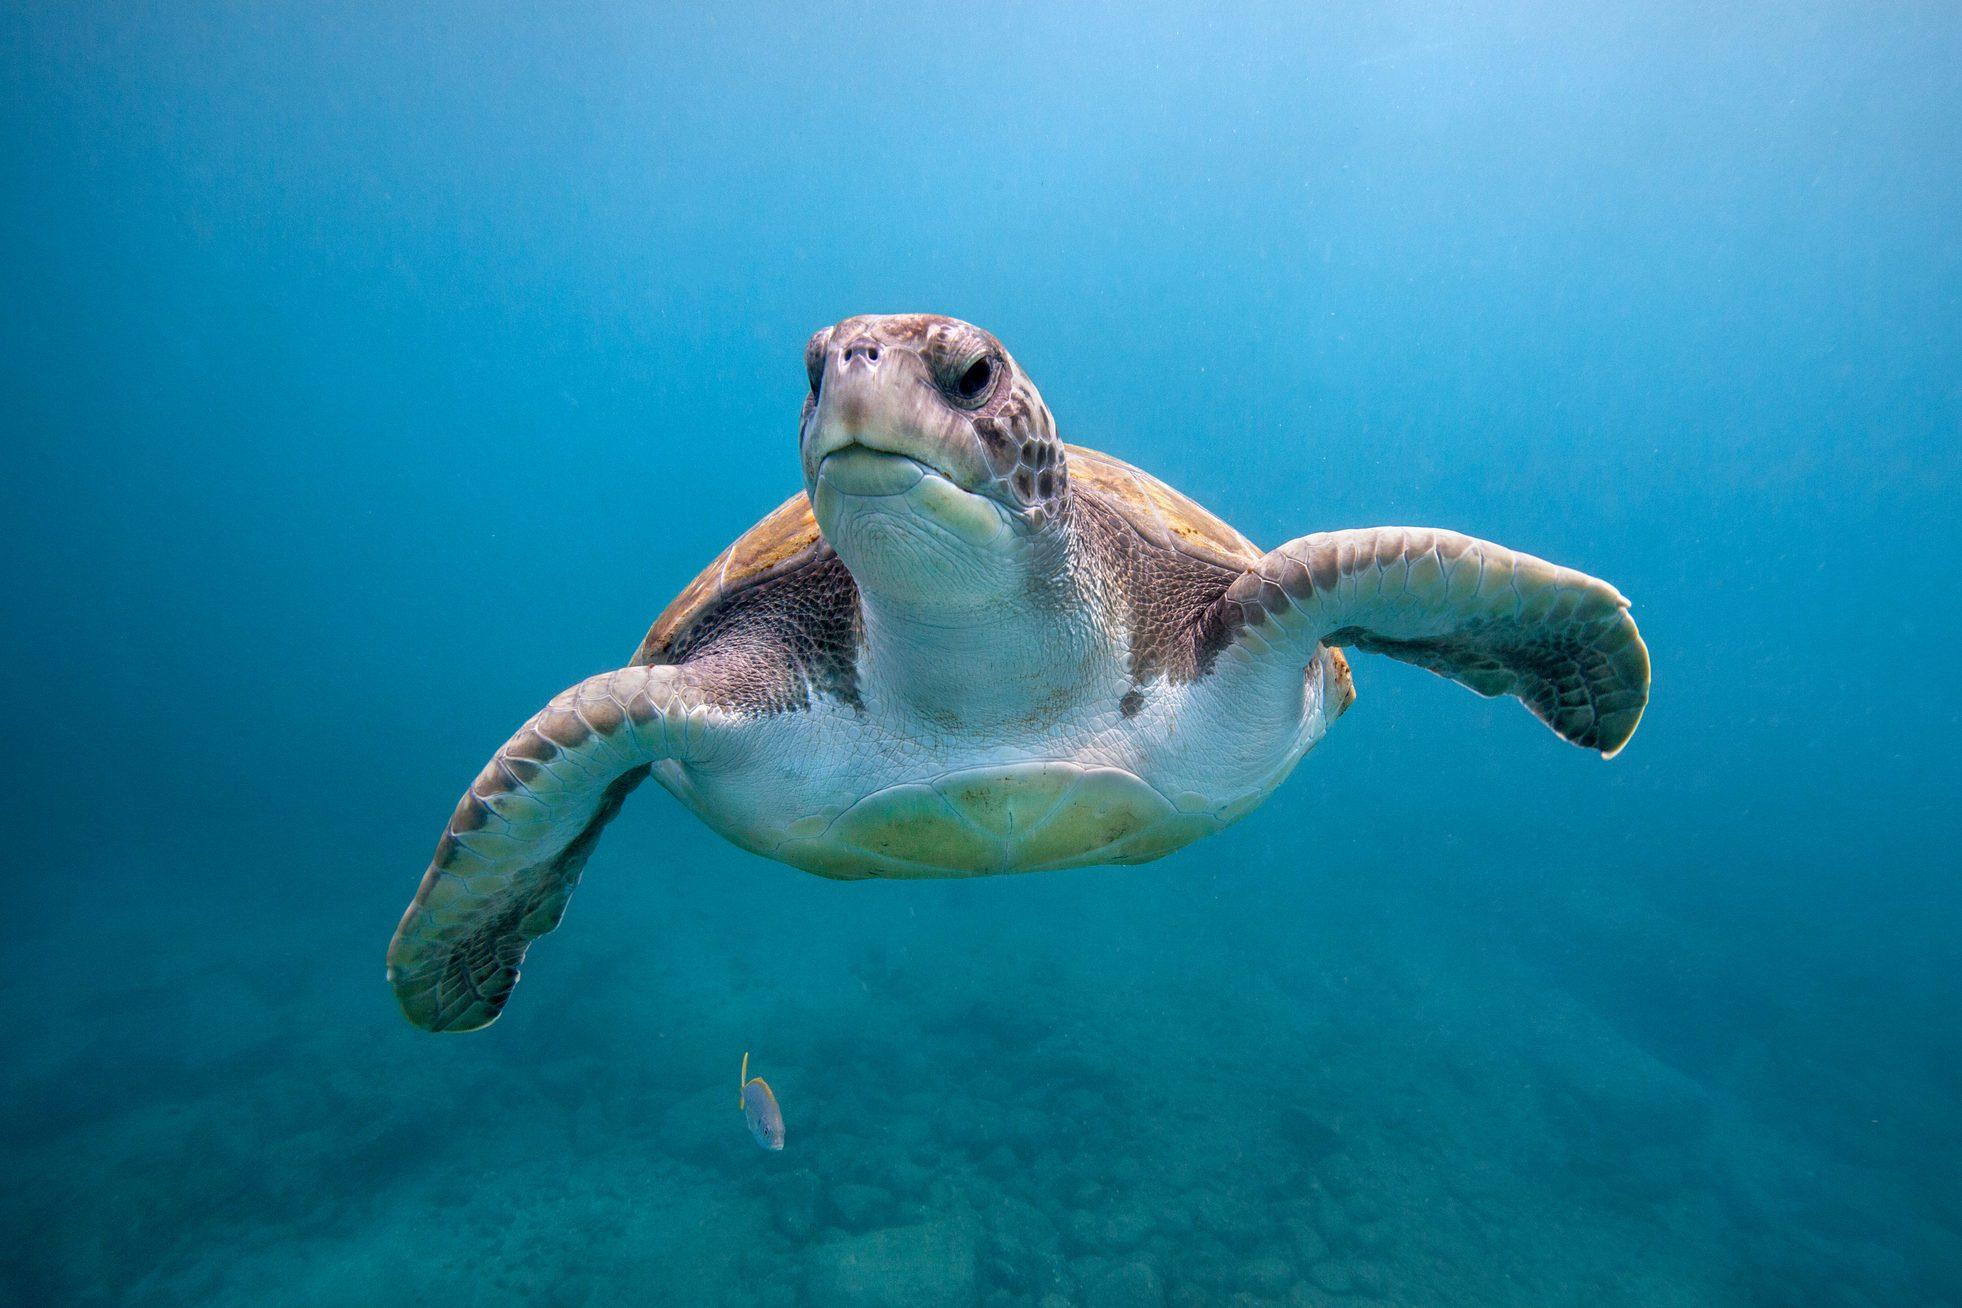 Green sea turtle off Canary Islands